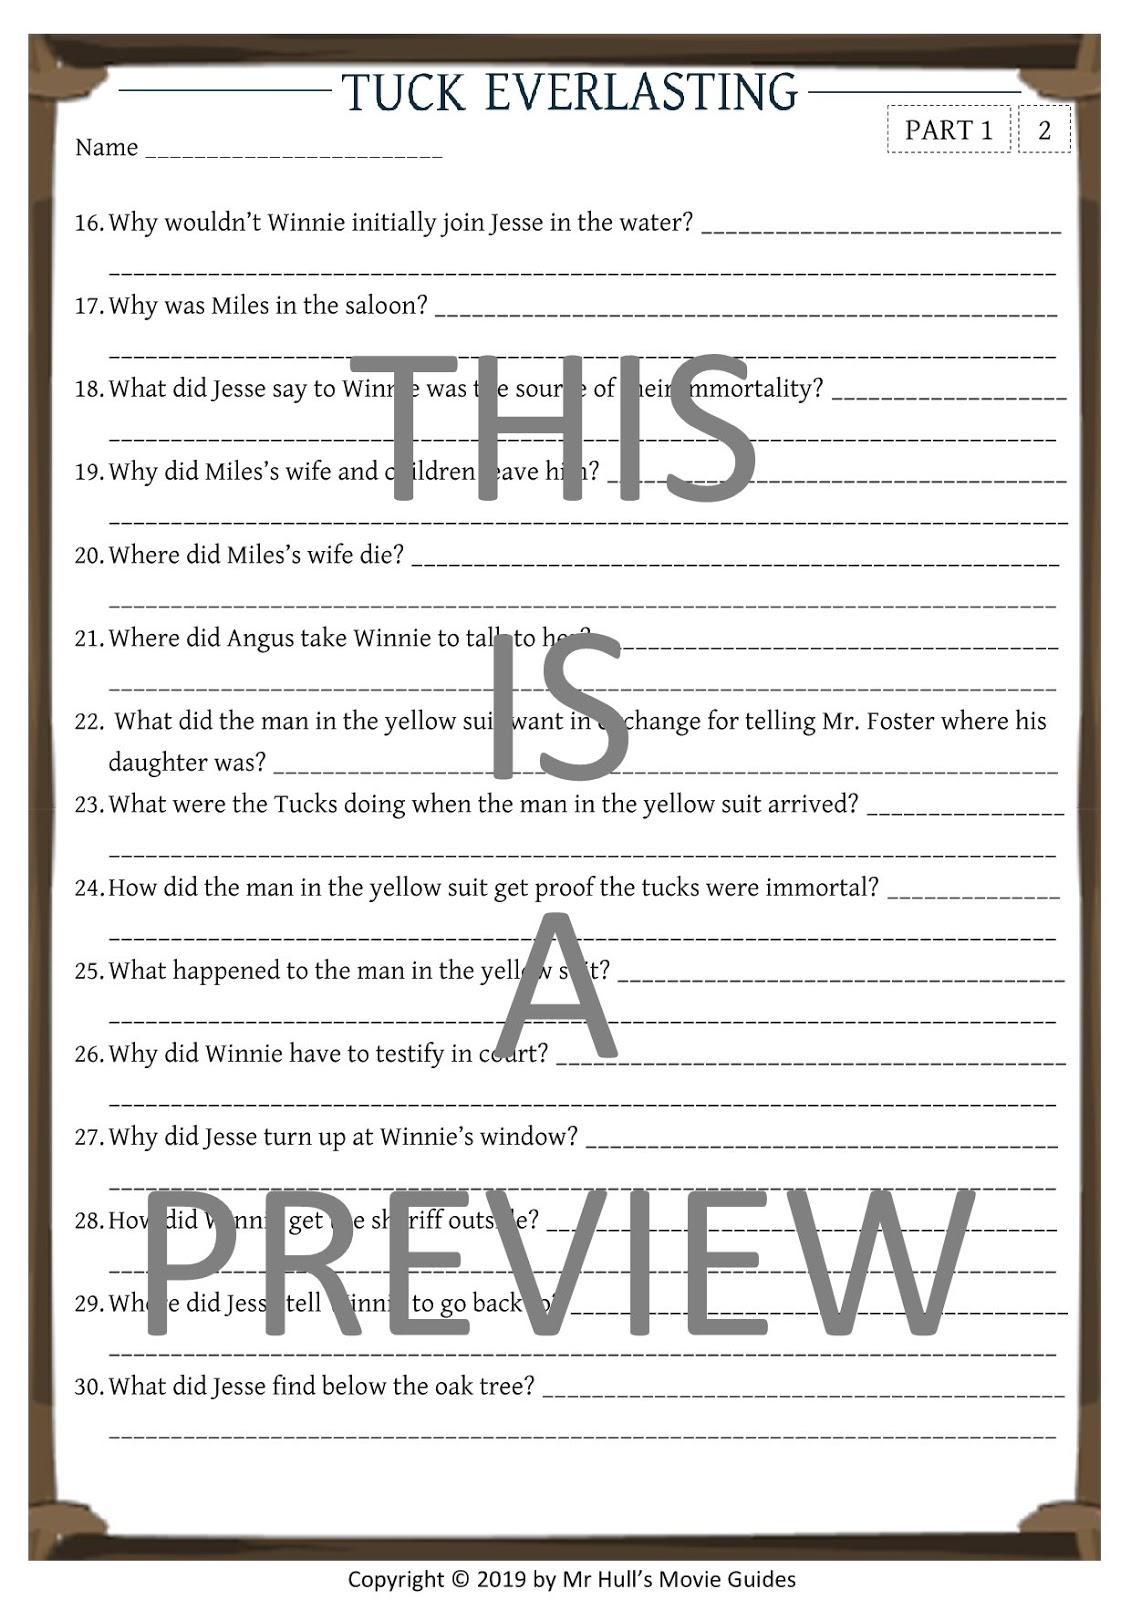 Tuck Everlasting Movie Guide + Activities - Answer Keys ...